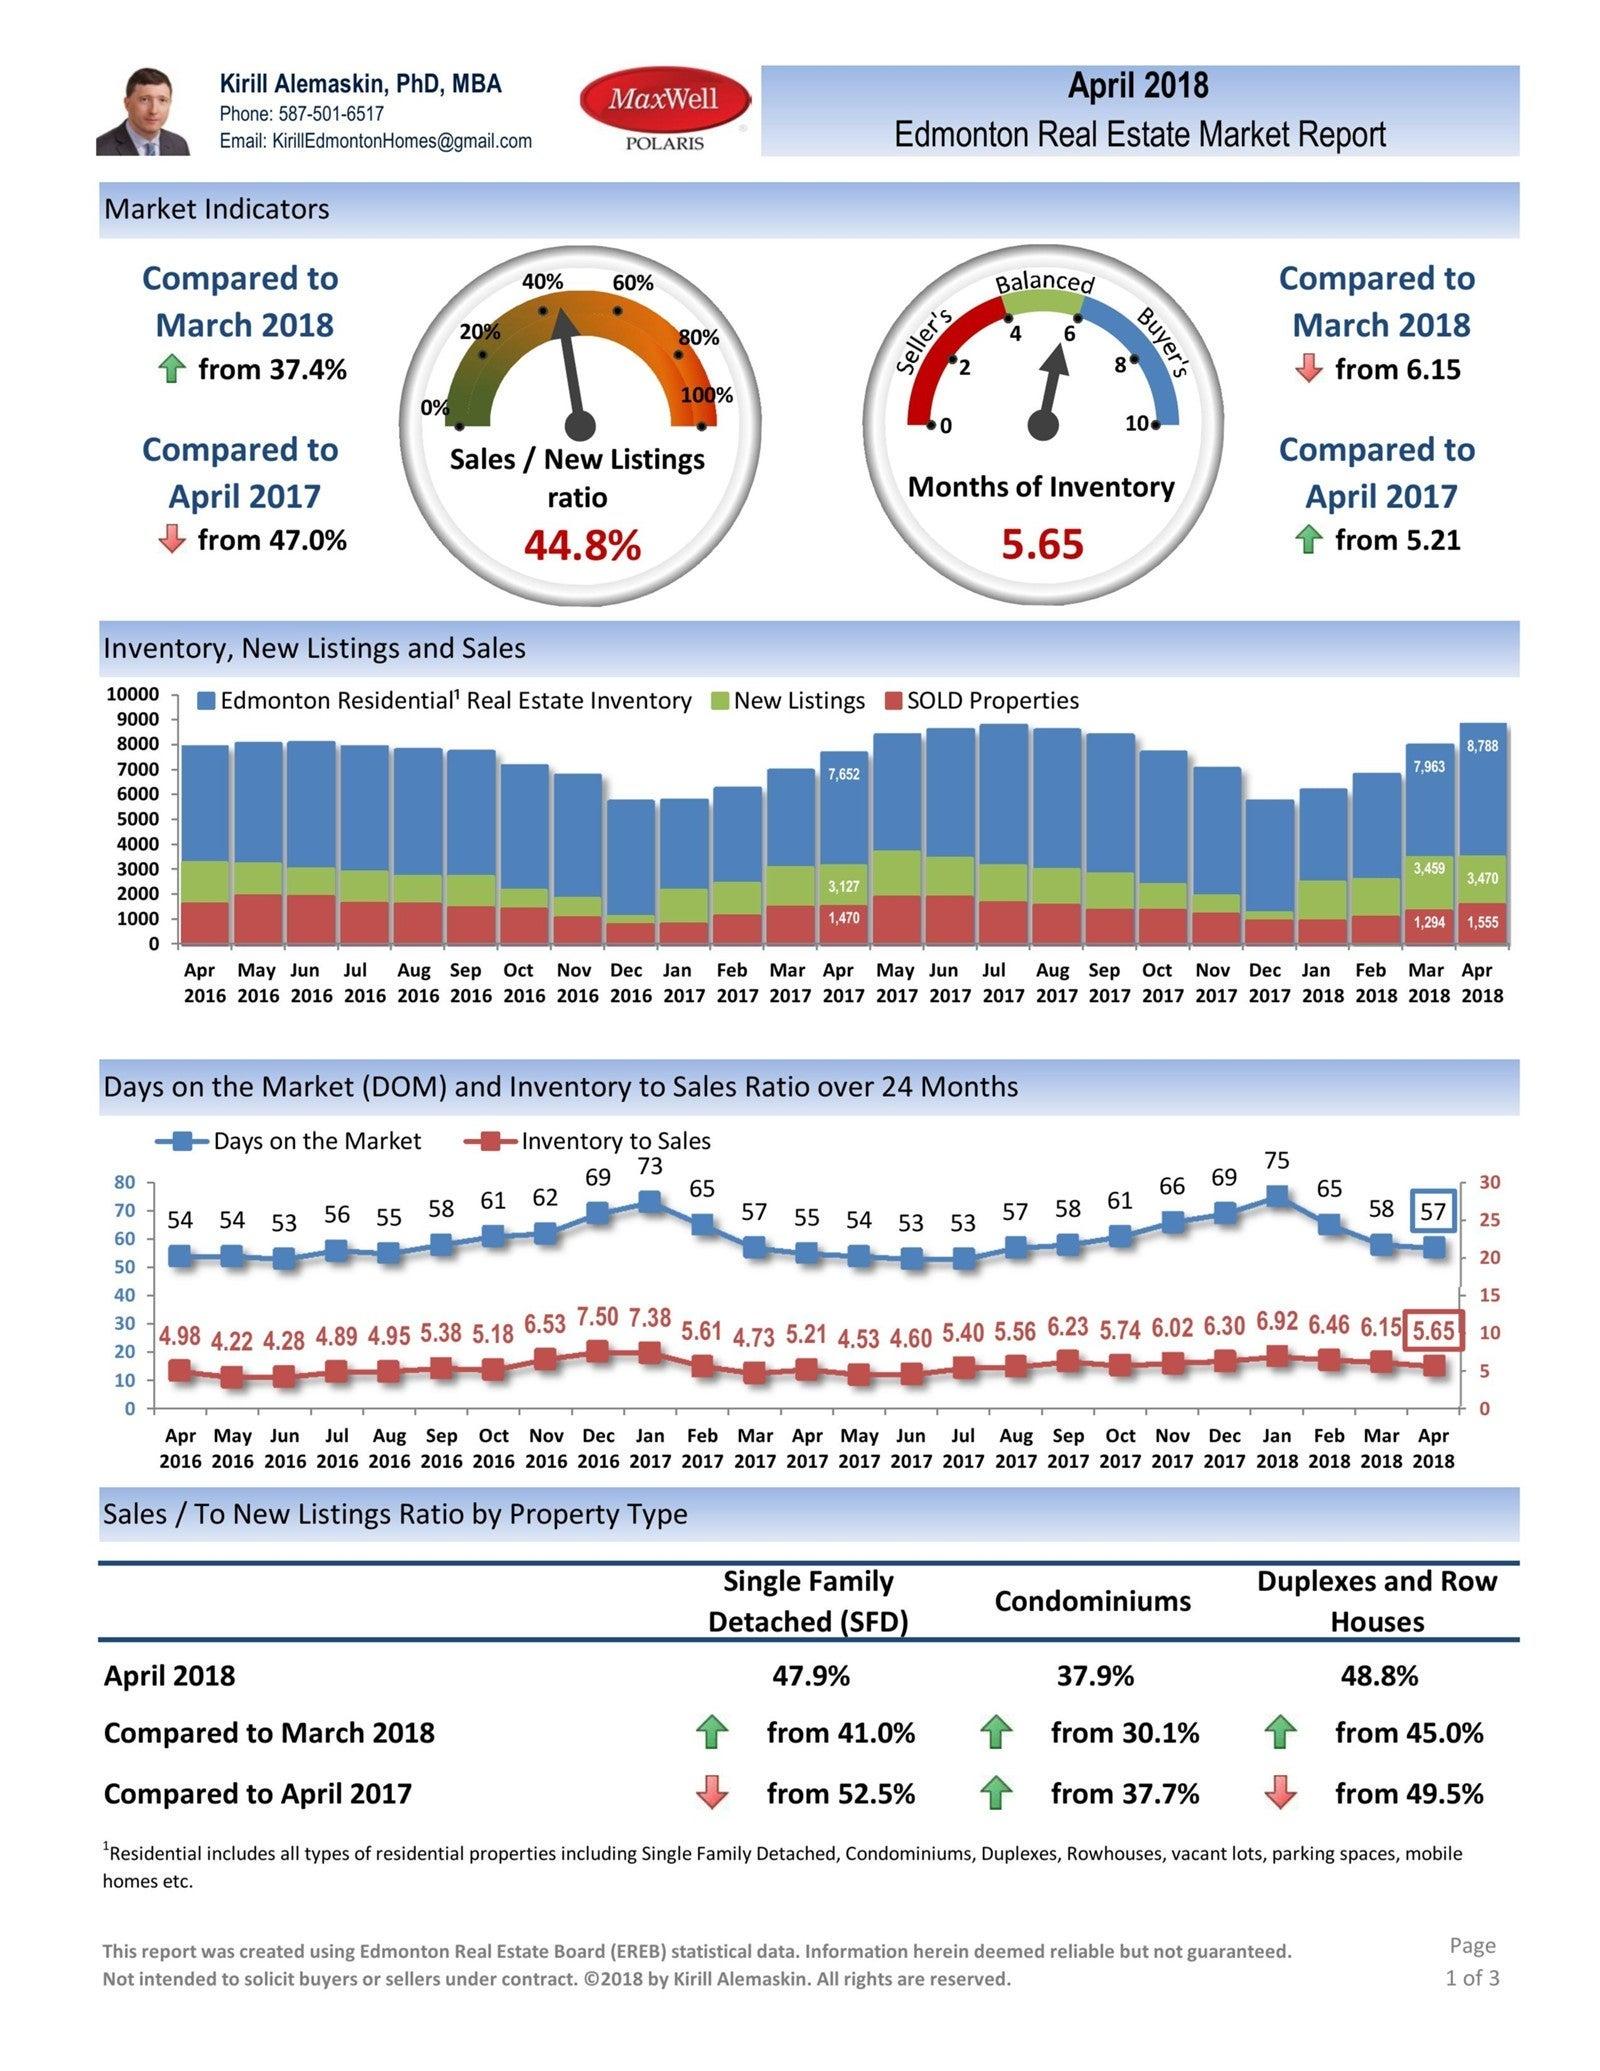 Preview: Edmonton Real Estate Market Report - April 2018